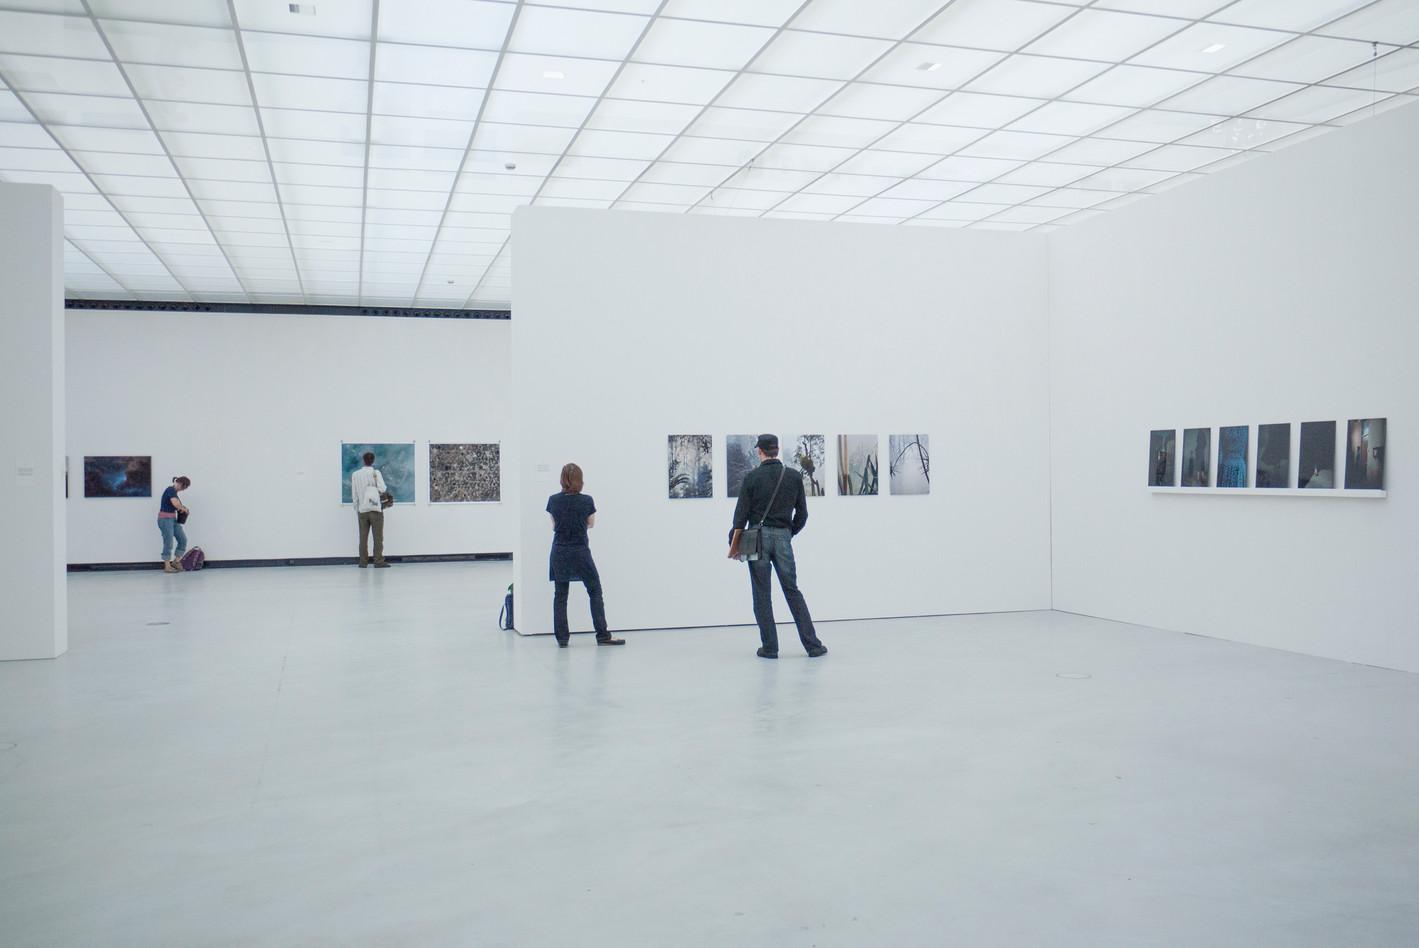 Fotosommer Stuttgart, Baden-Wüttenbergischer Kunstverein, DE, 2010